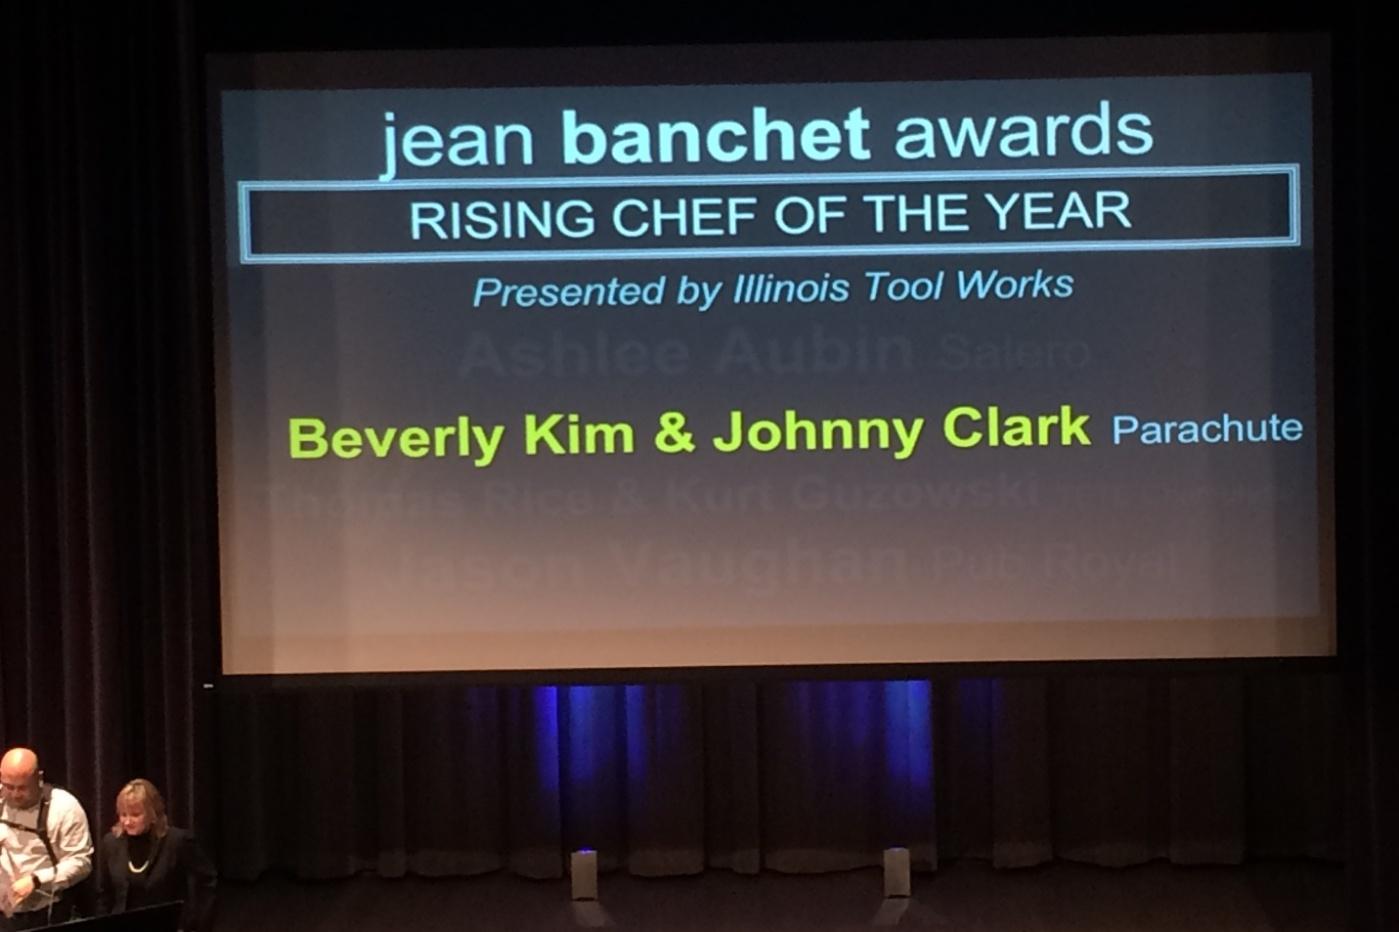 2016_01_17 jean banquet awards 003